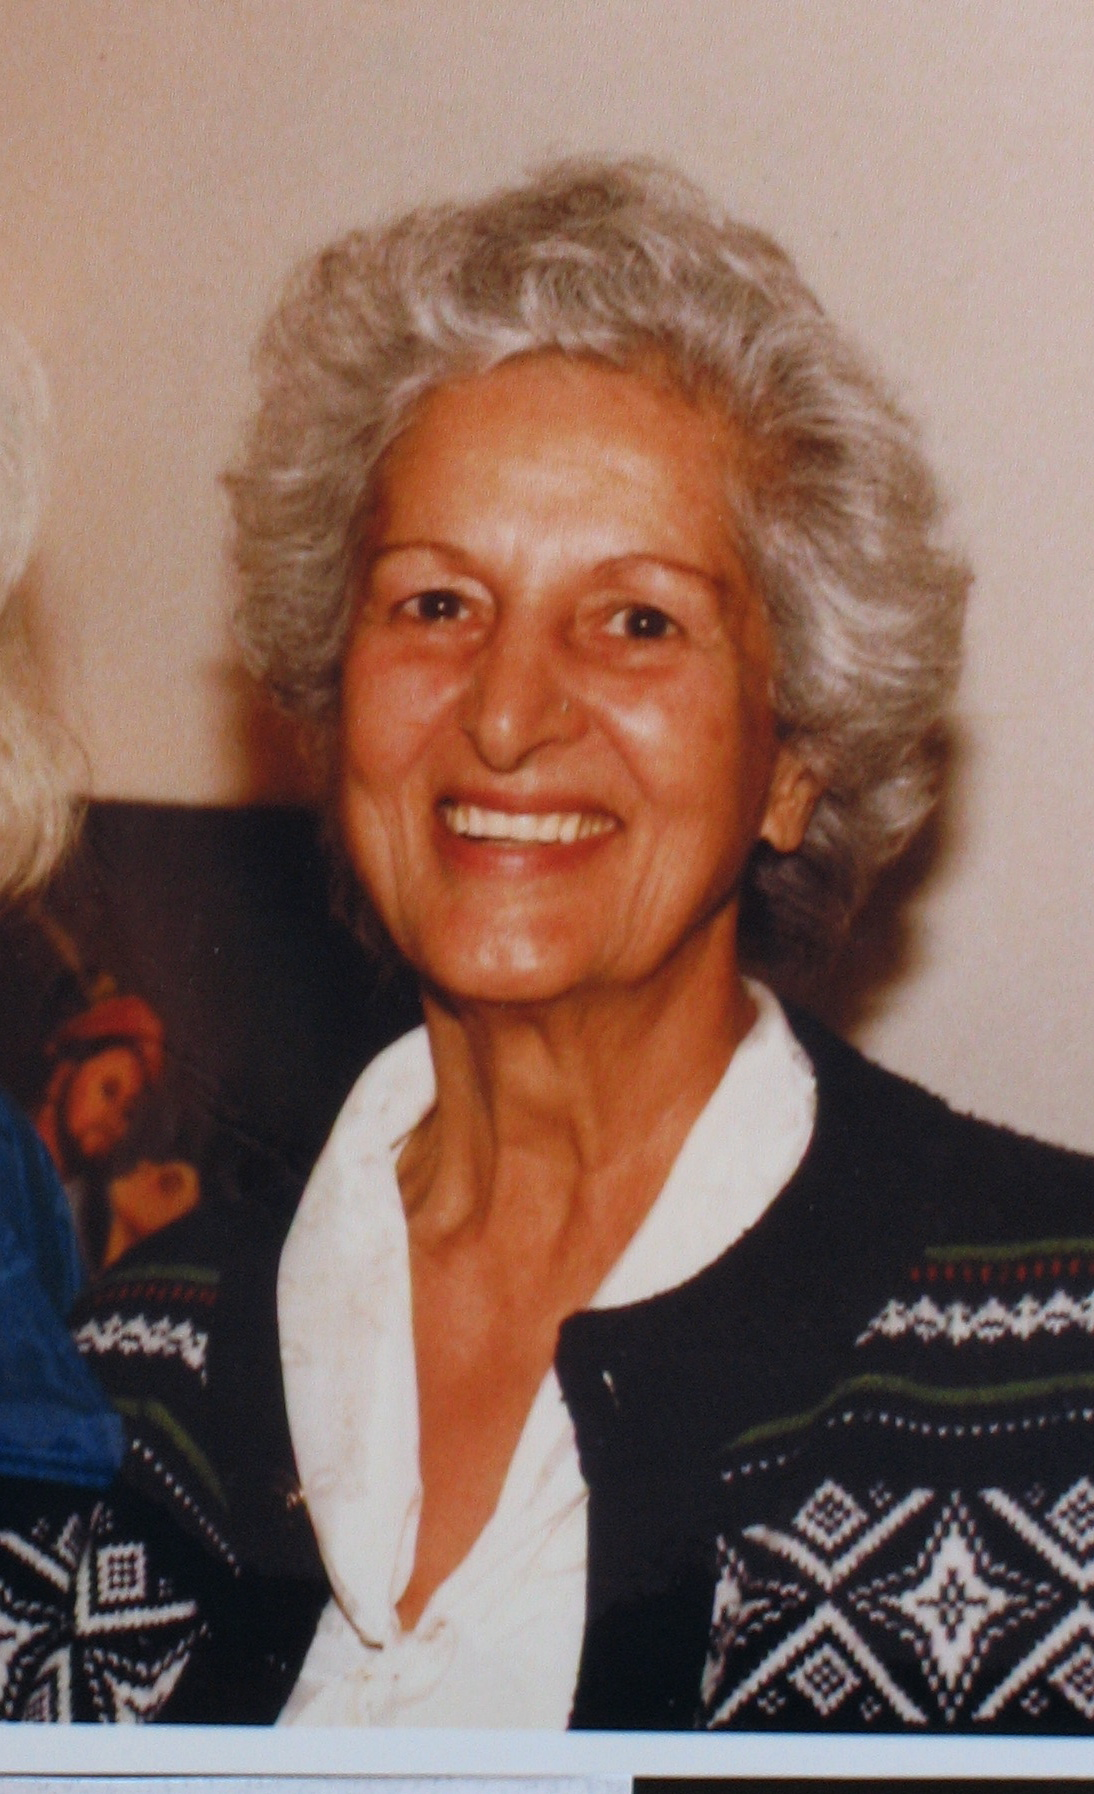 Photo of Kar Dhillon in the 1960's.